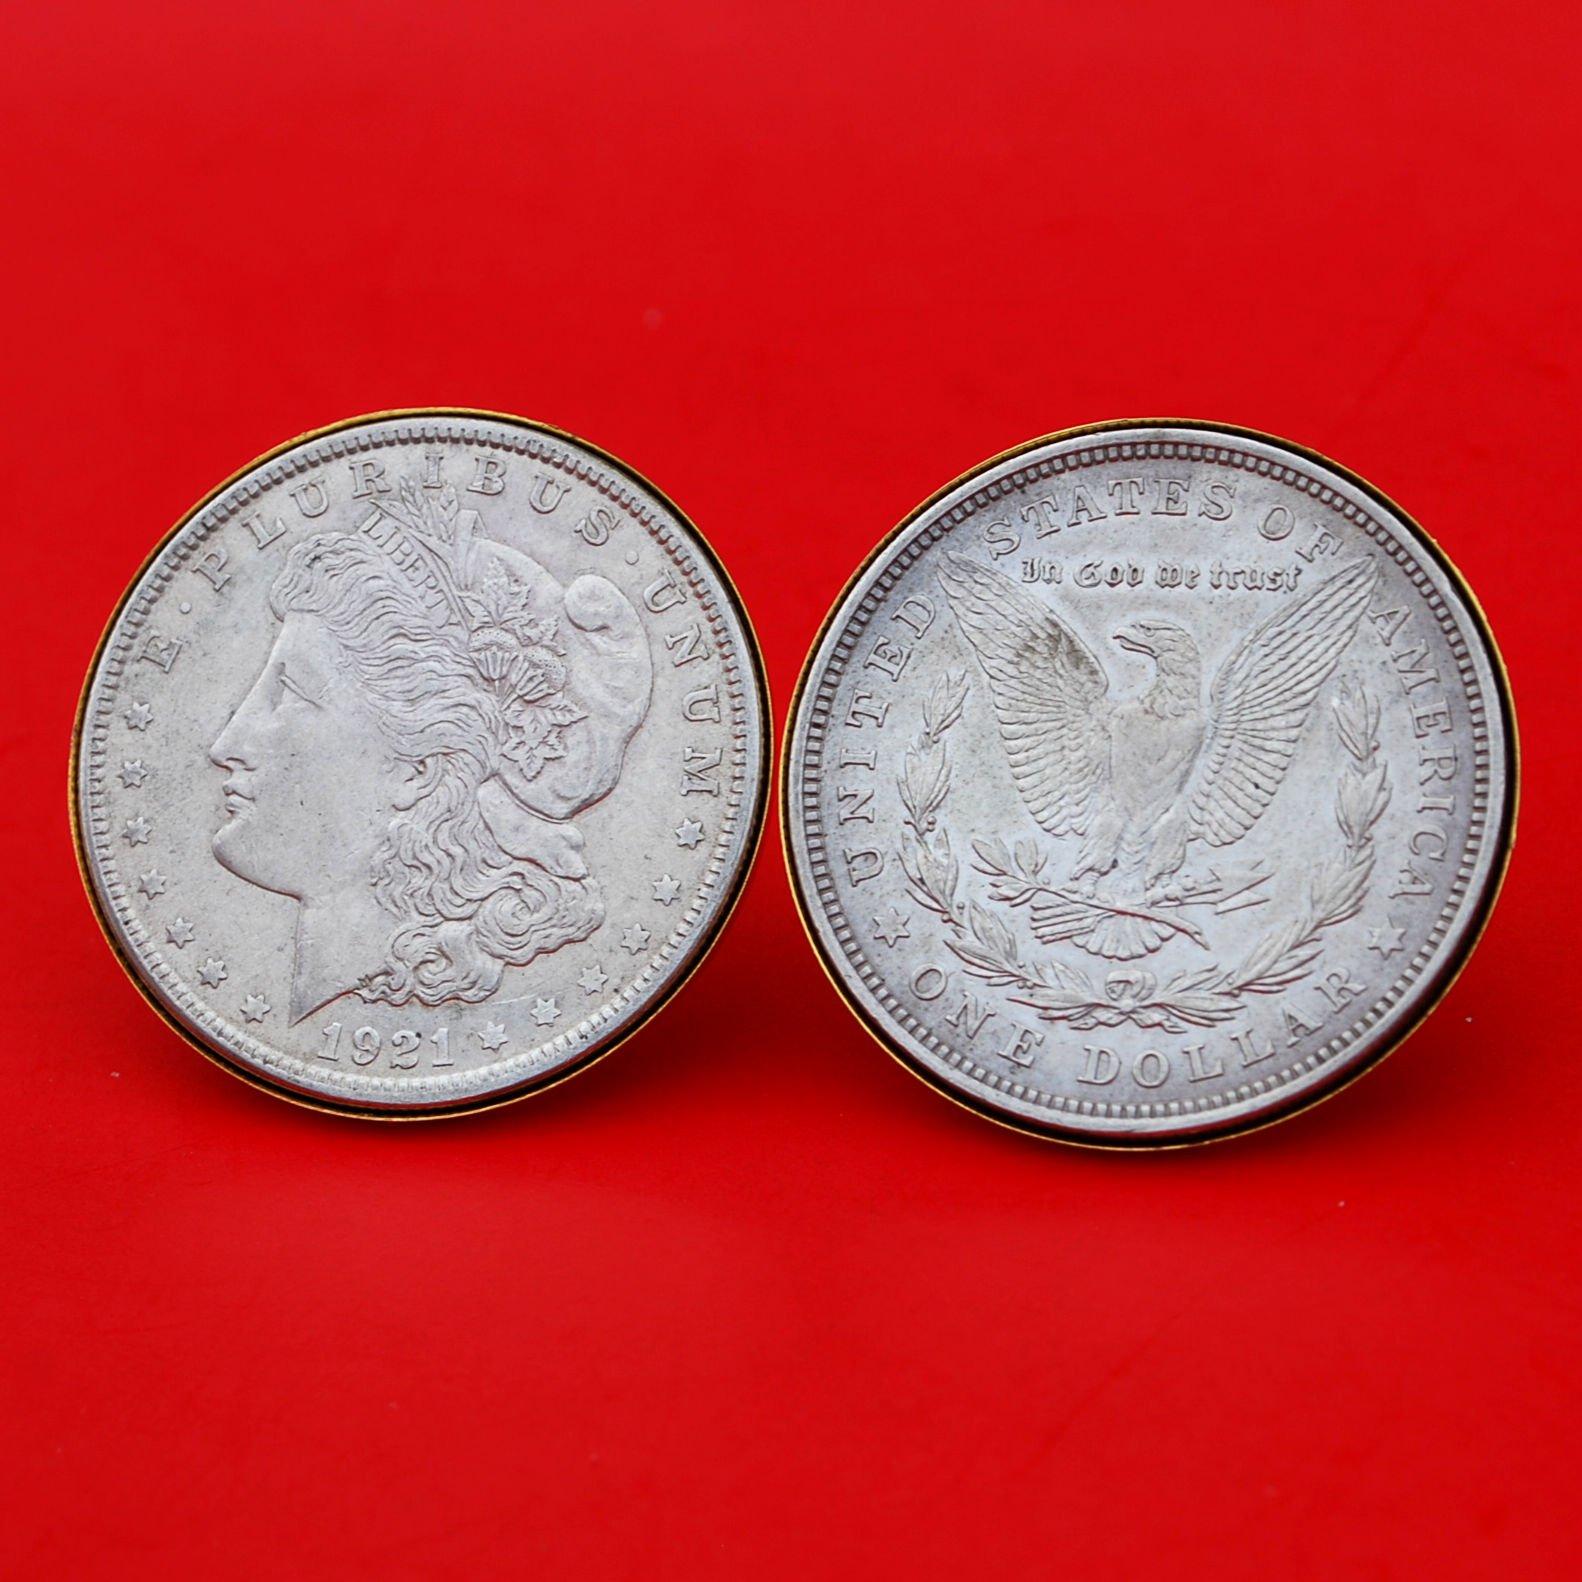 US 1921 Morgan Silver Dollar Gold Cufflinks NEW - OBVERSE + REVERSE